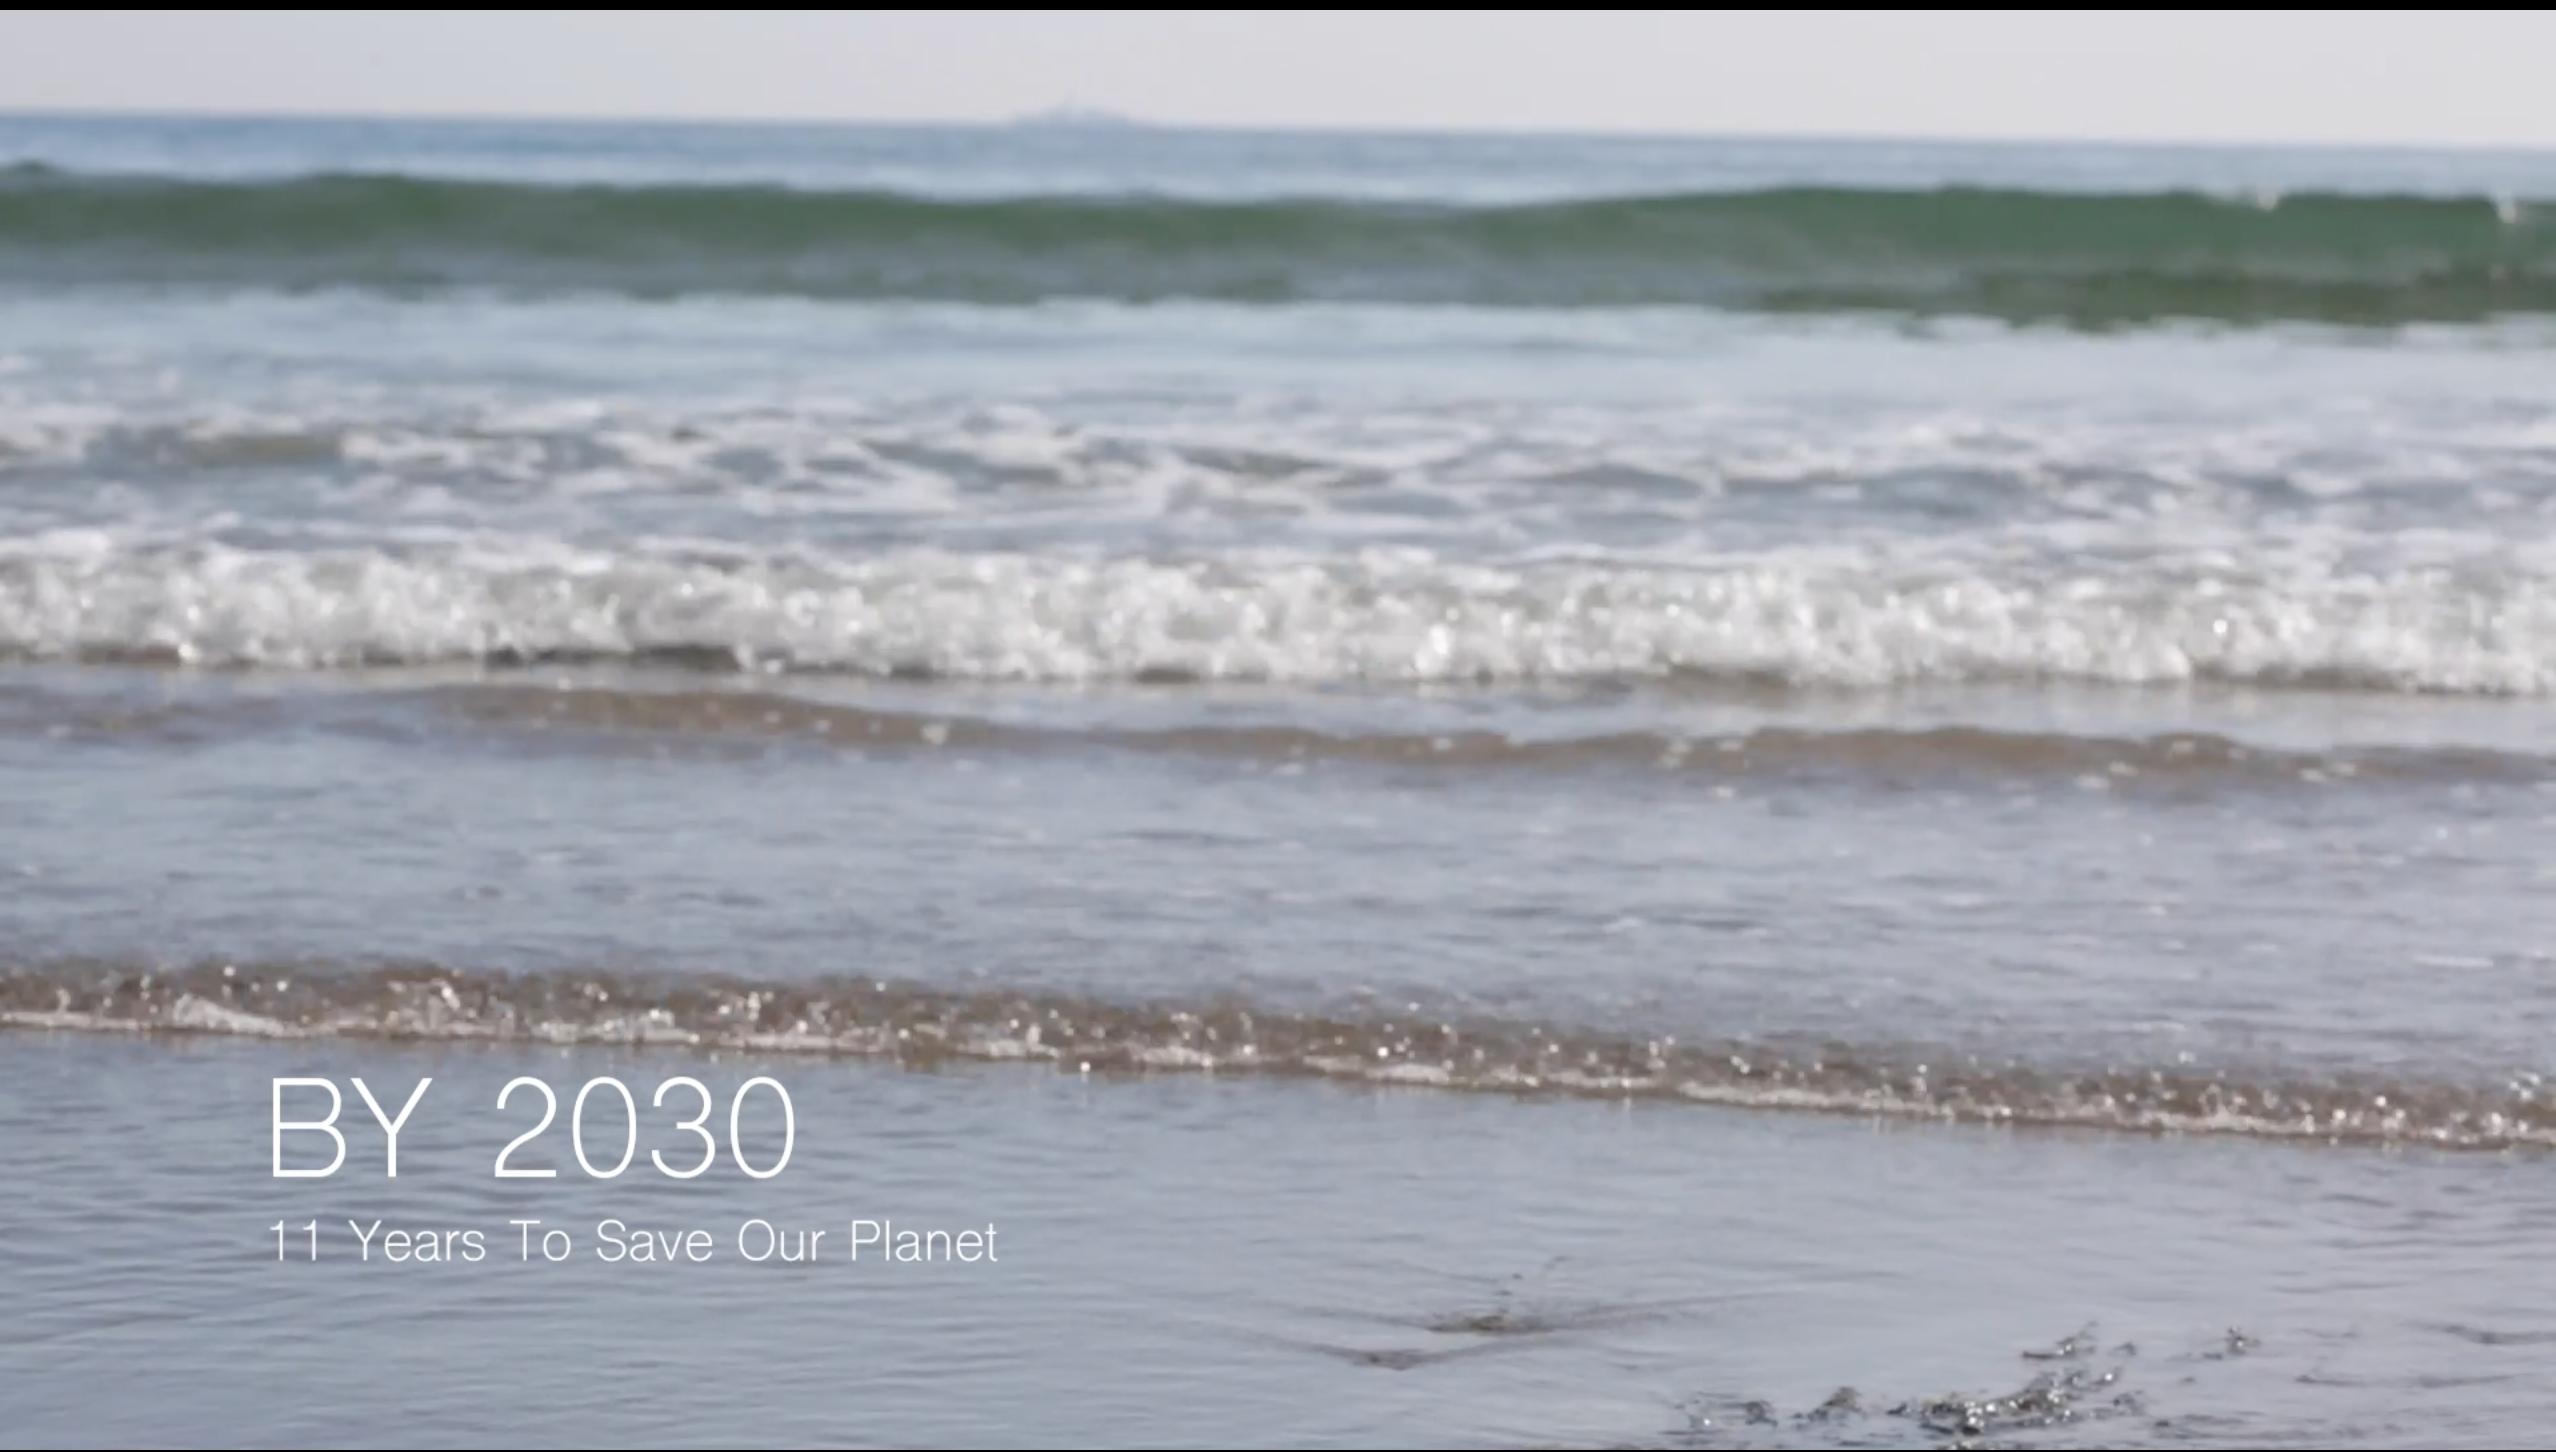 BY 2030